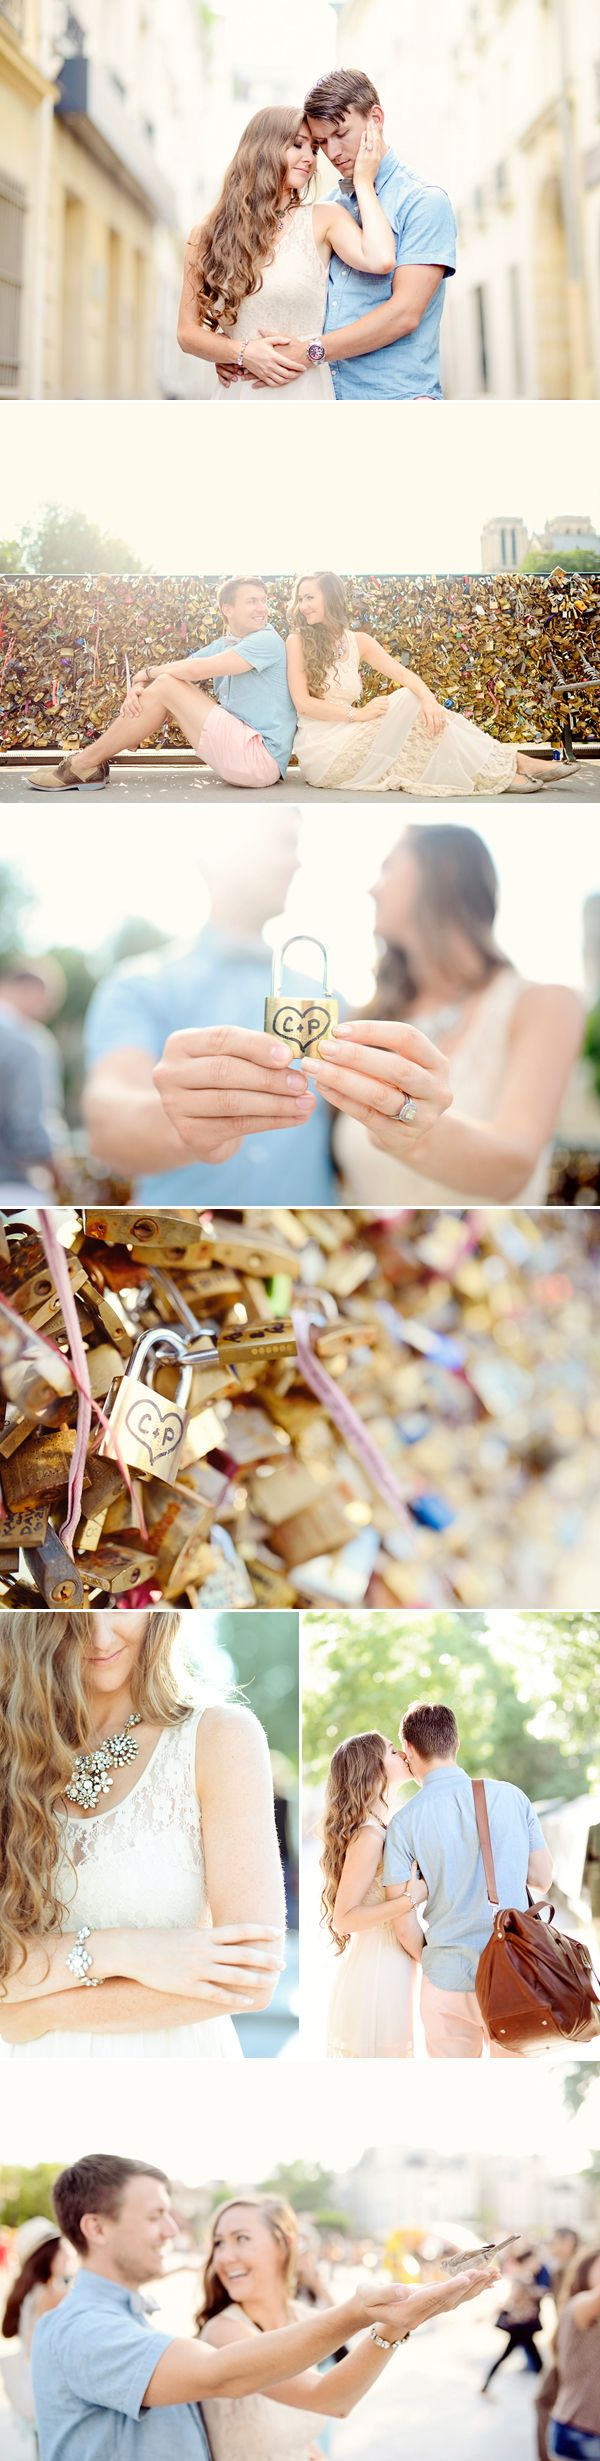 Romantic Paris Honeymoon Session (from Emm and Clau)